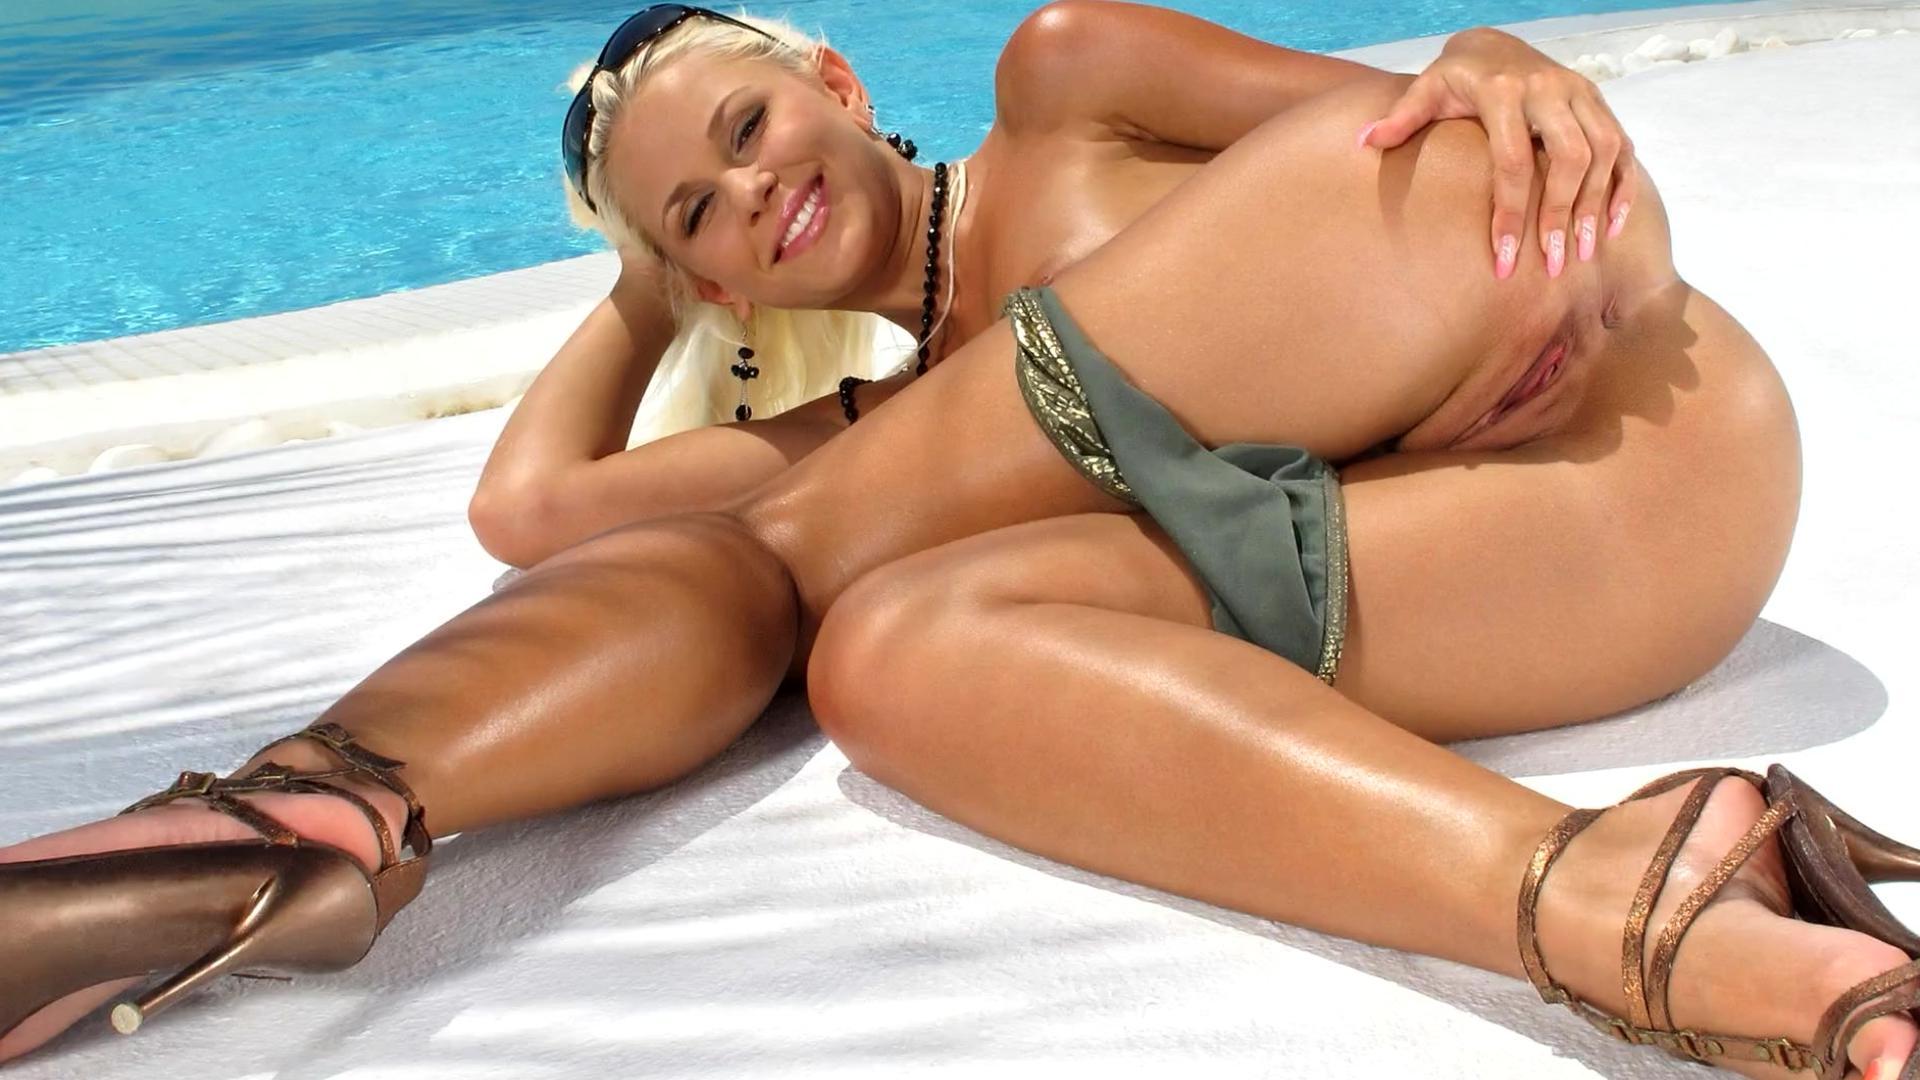 фото на море эротику смотреть онлайн